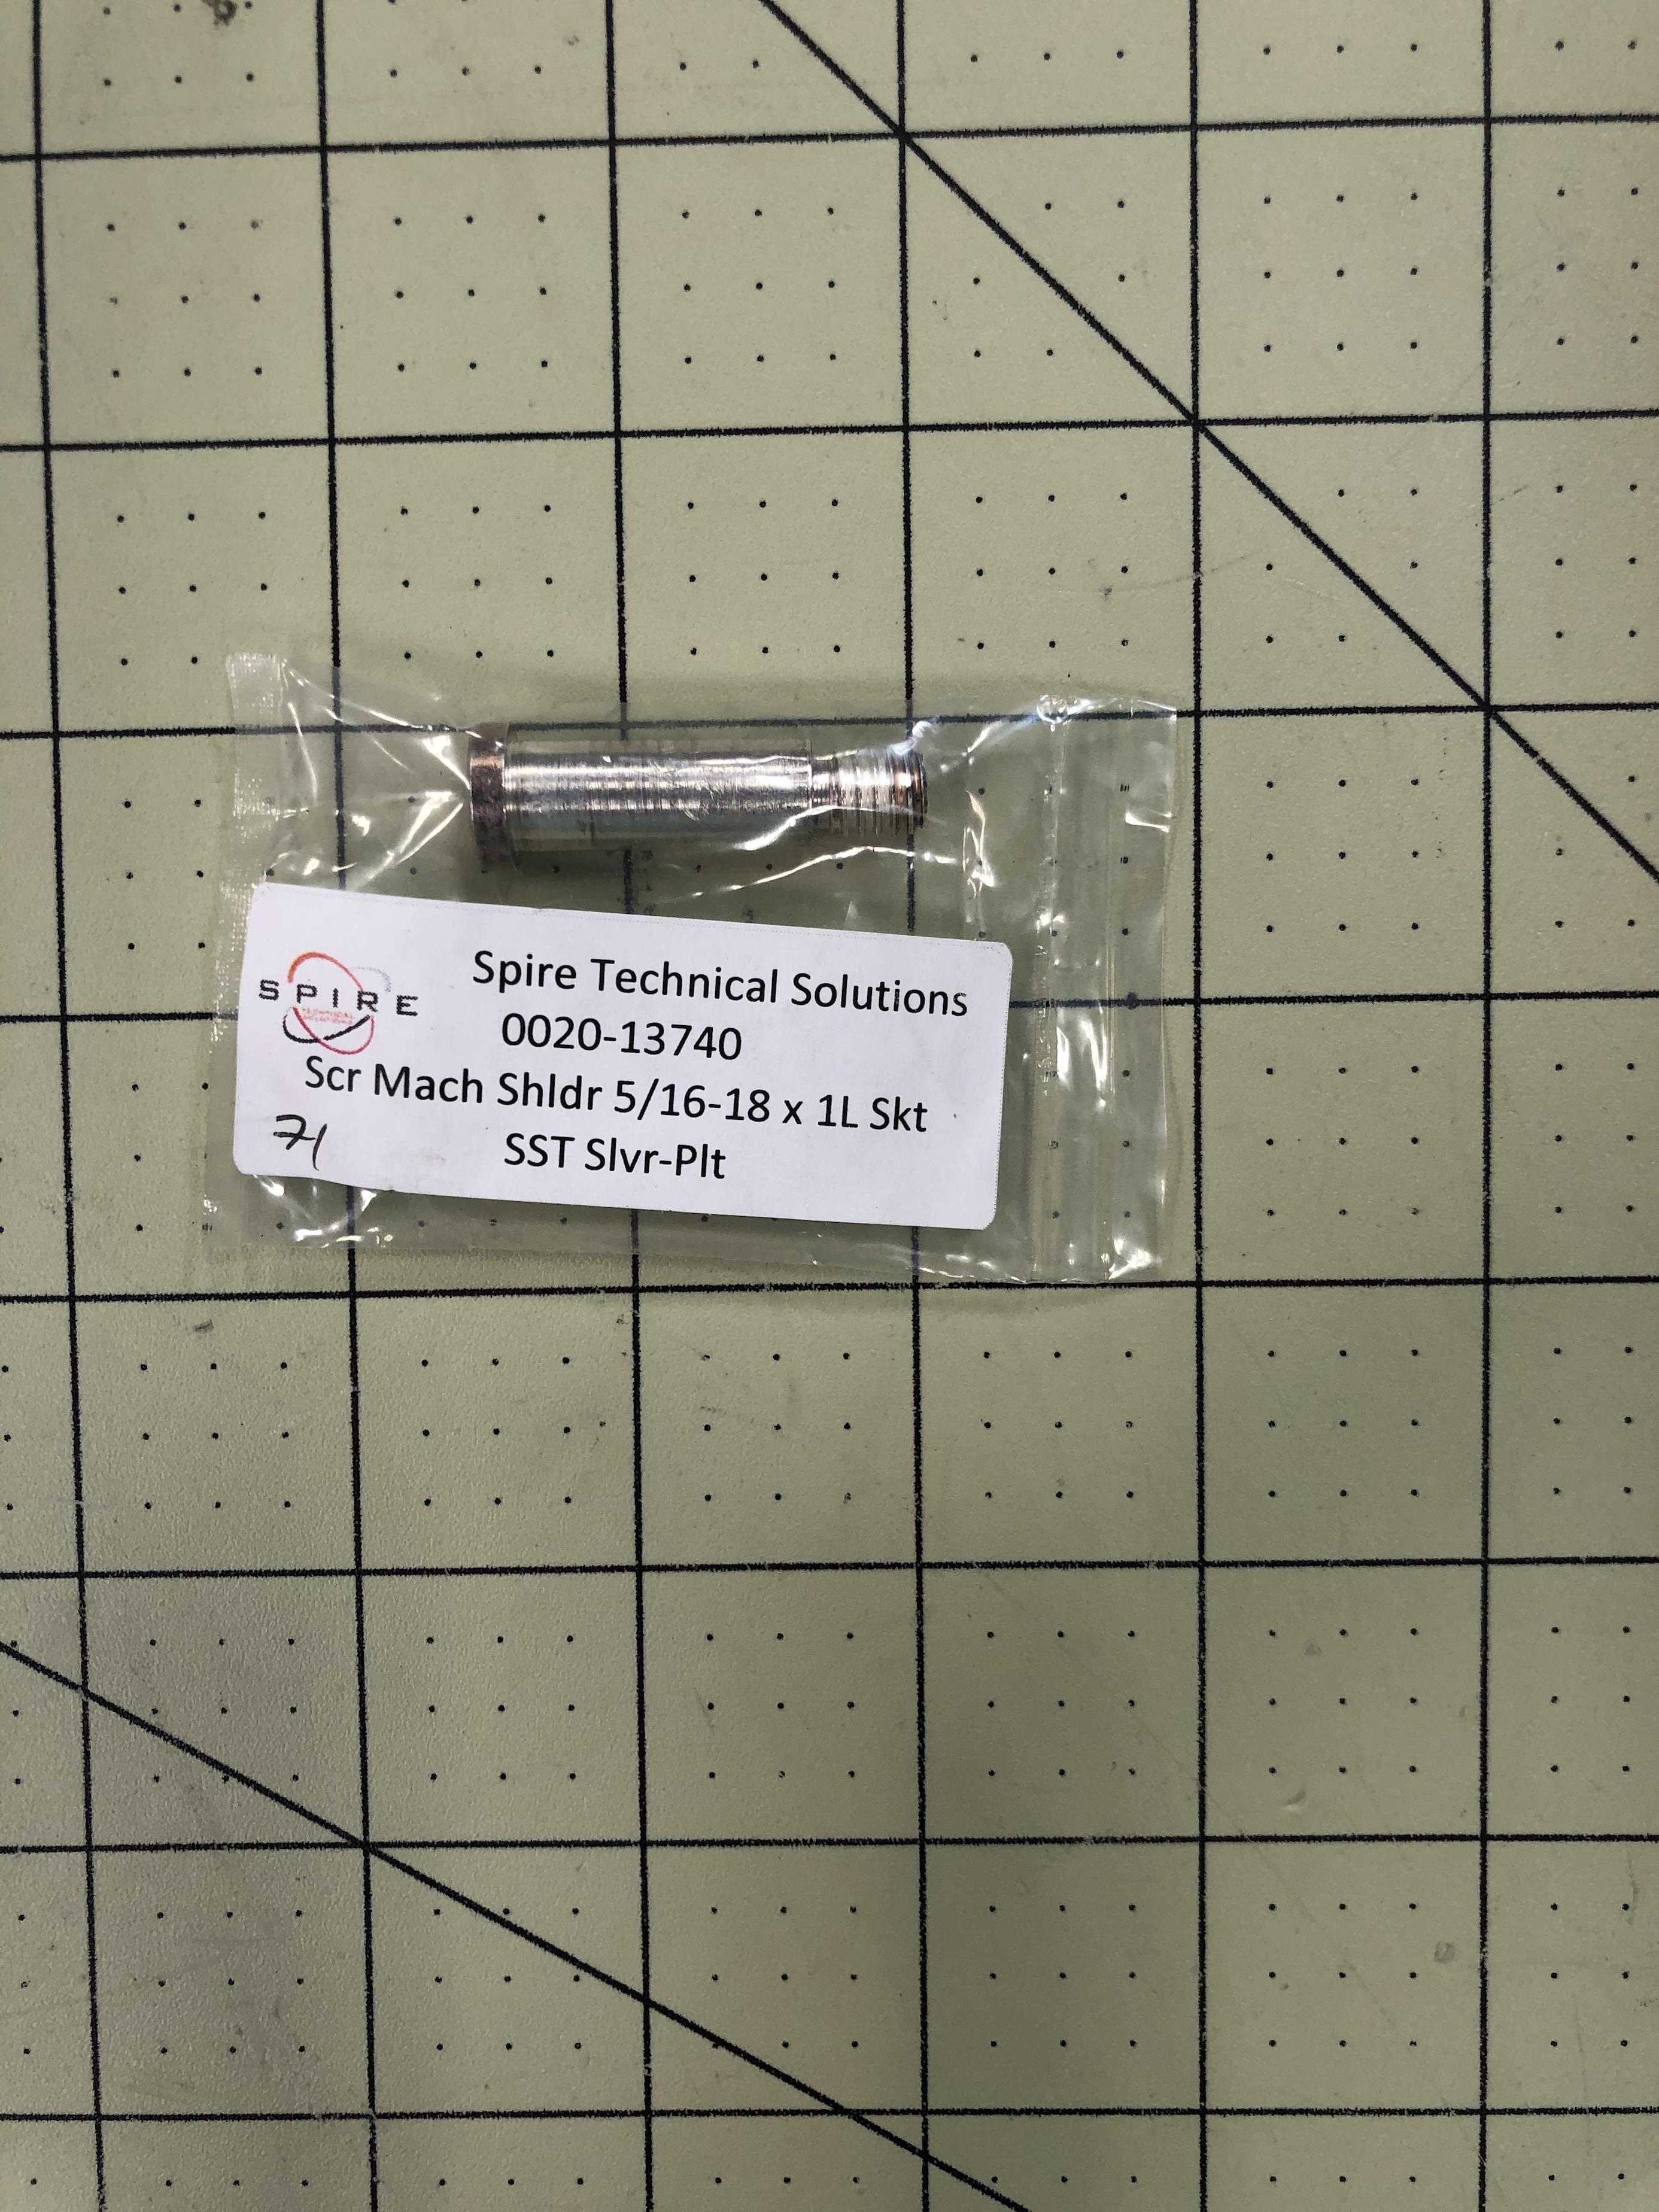 SCR Mach Shldr 5/16-18x1L Skt